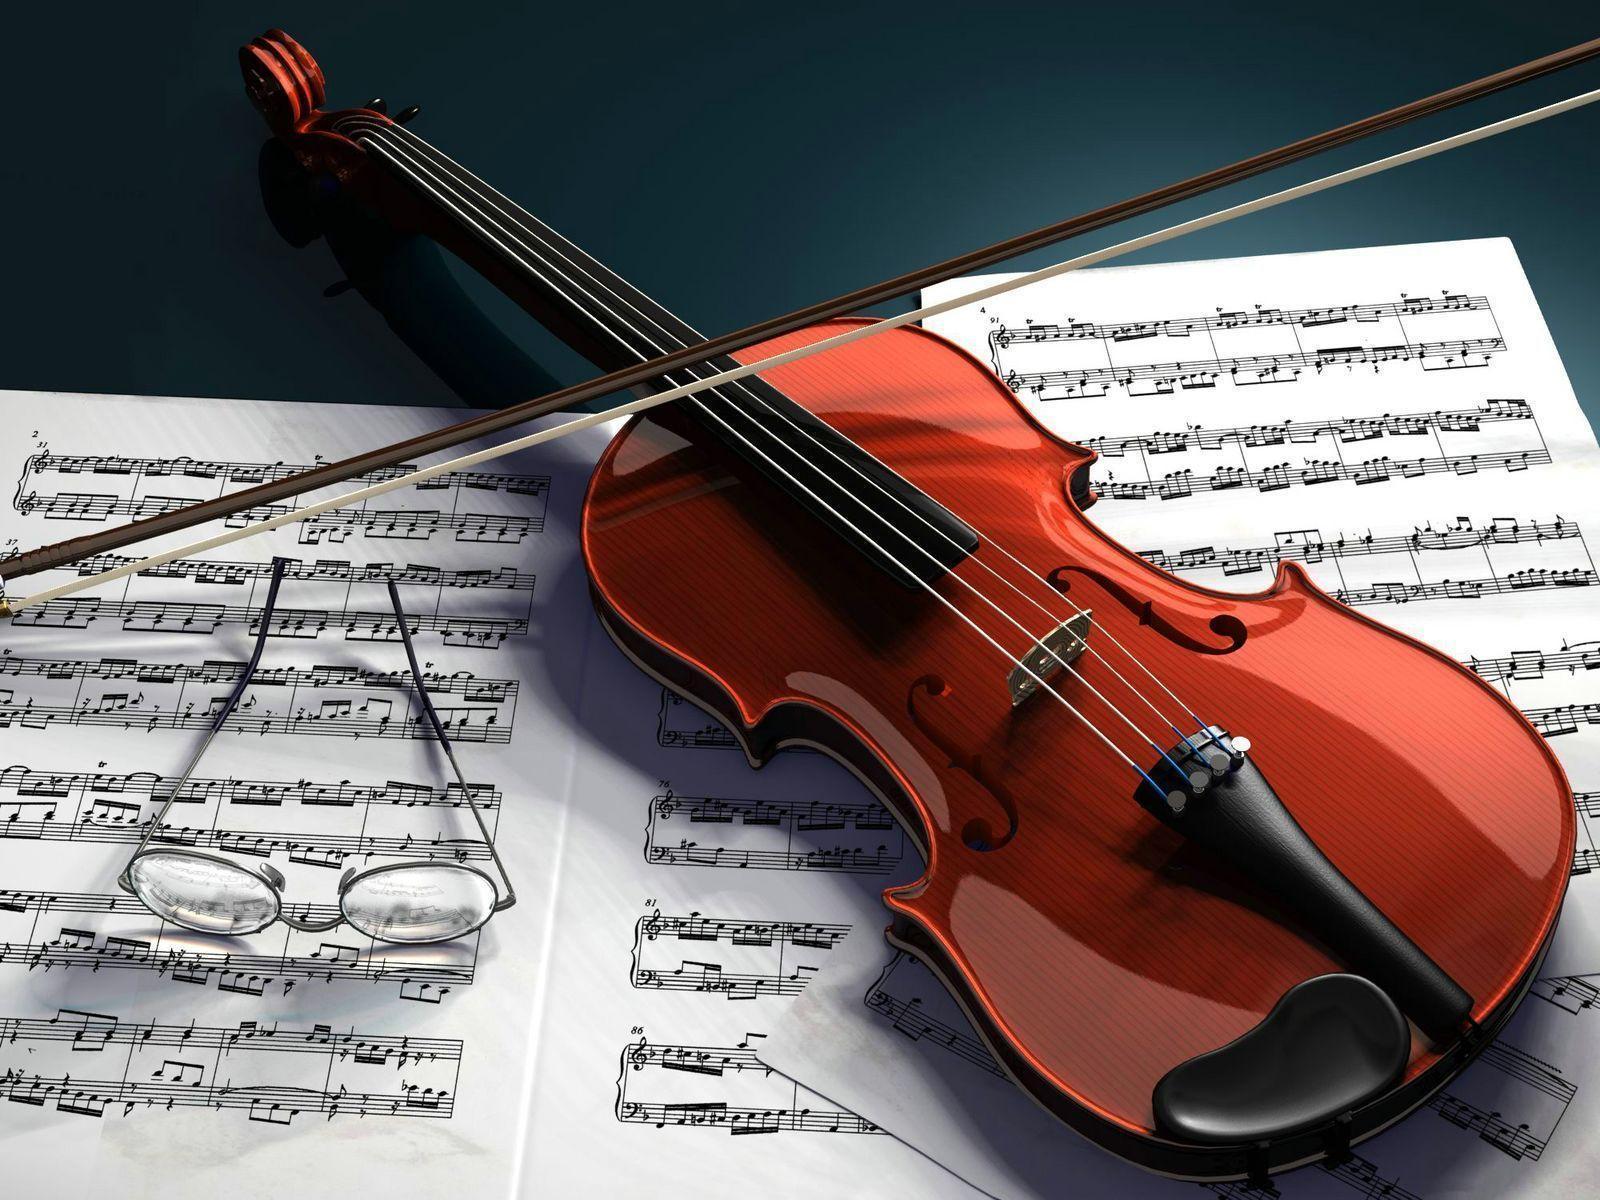 Playing Violin Instrument Wallpaper #6478 Wallpaper | Wallpaper ...